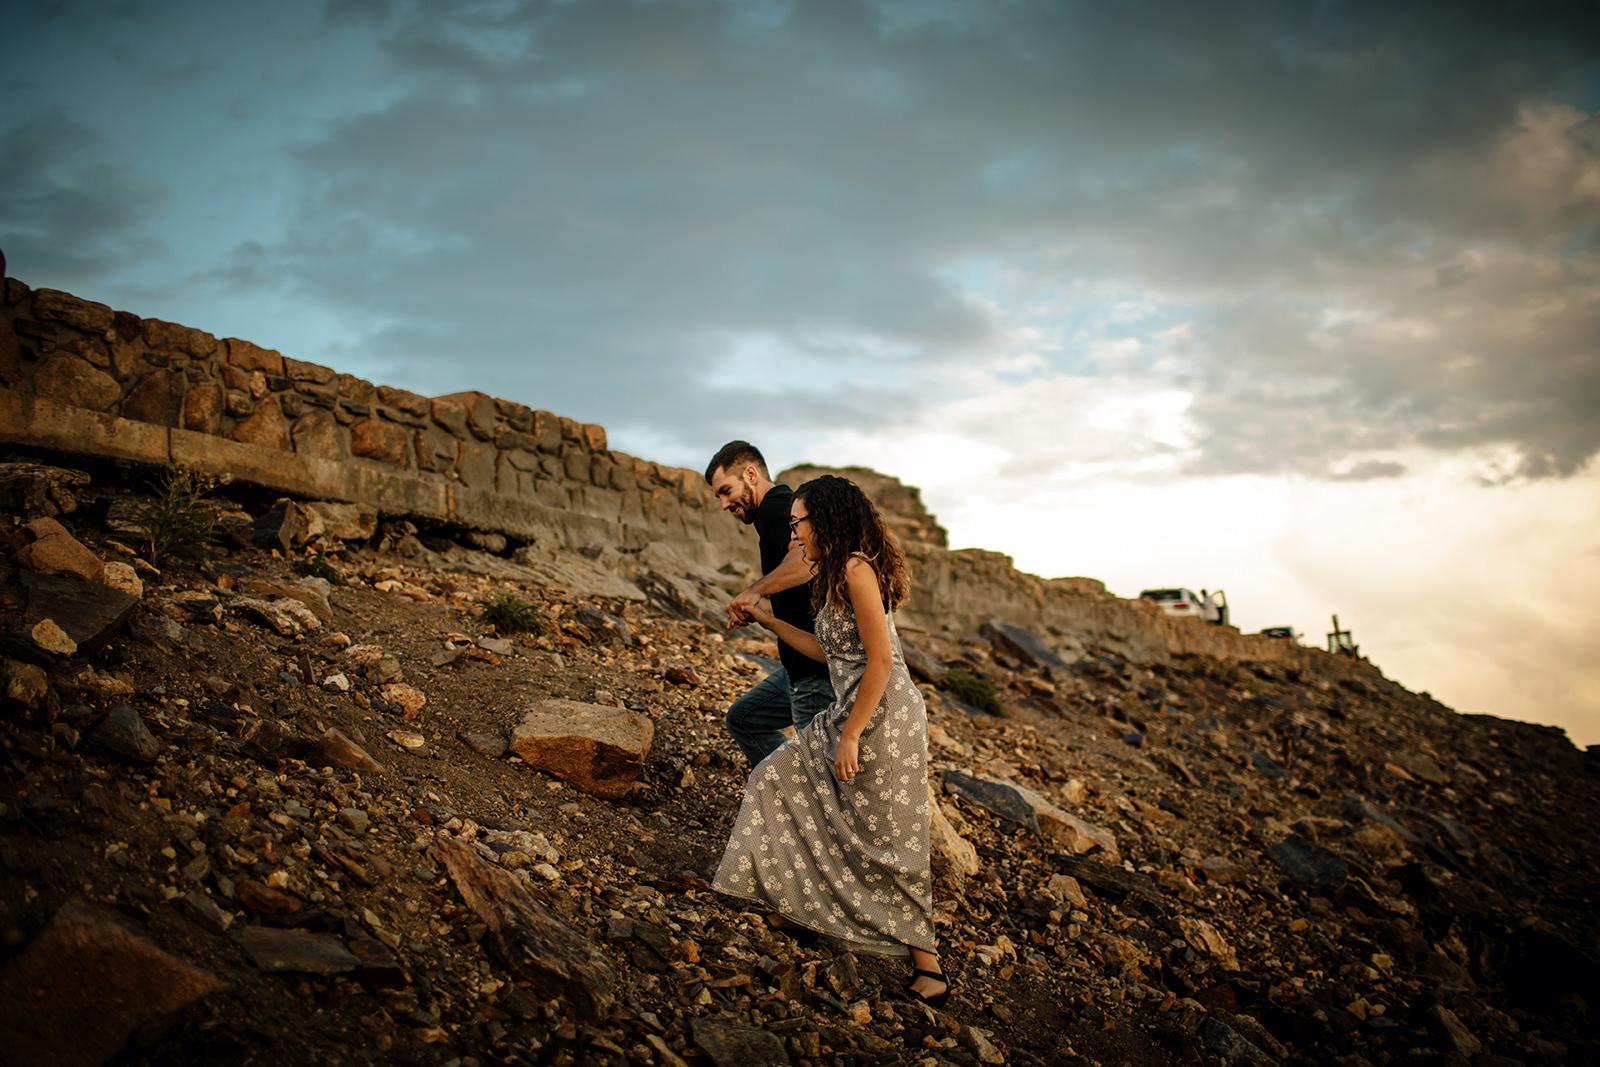 Liz Osban Photography Cheyenne Wyoming Engagement Wedding Photographer couple adventure elopement wedding laramie denver fort collins colorado rocky mountain national park27.jpg